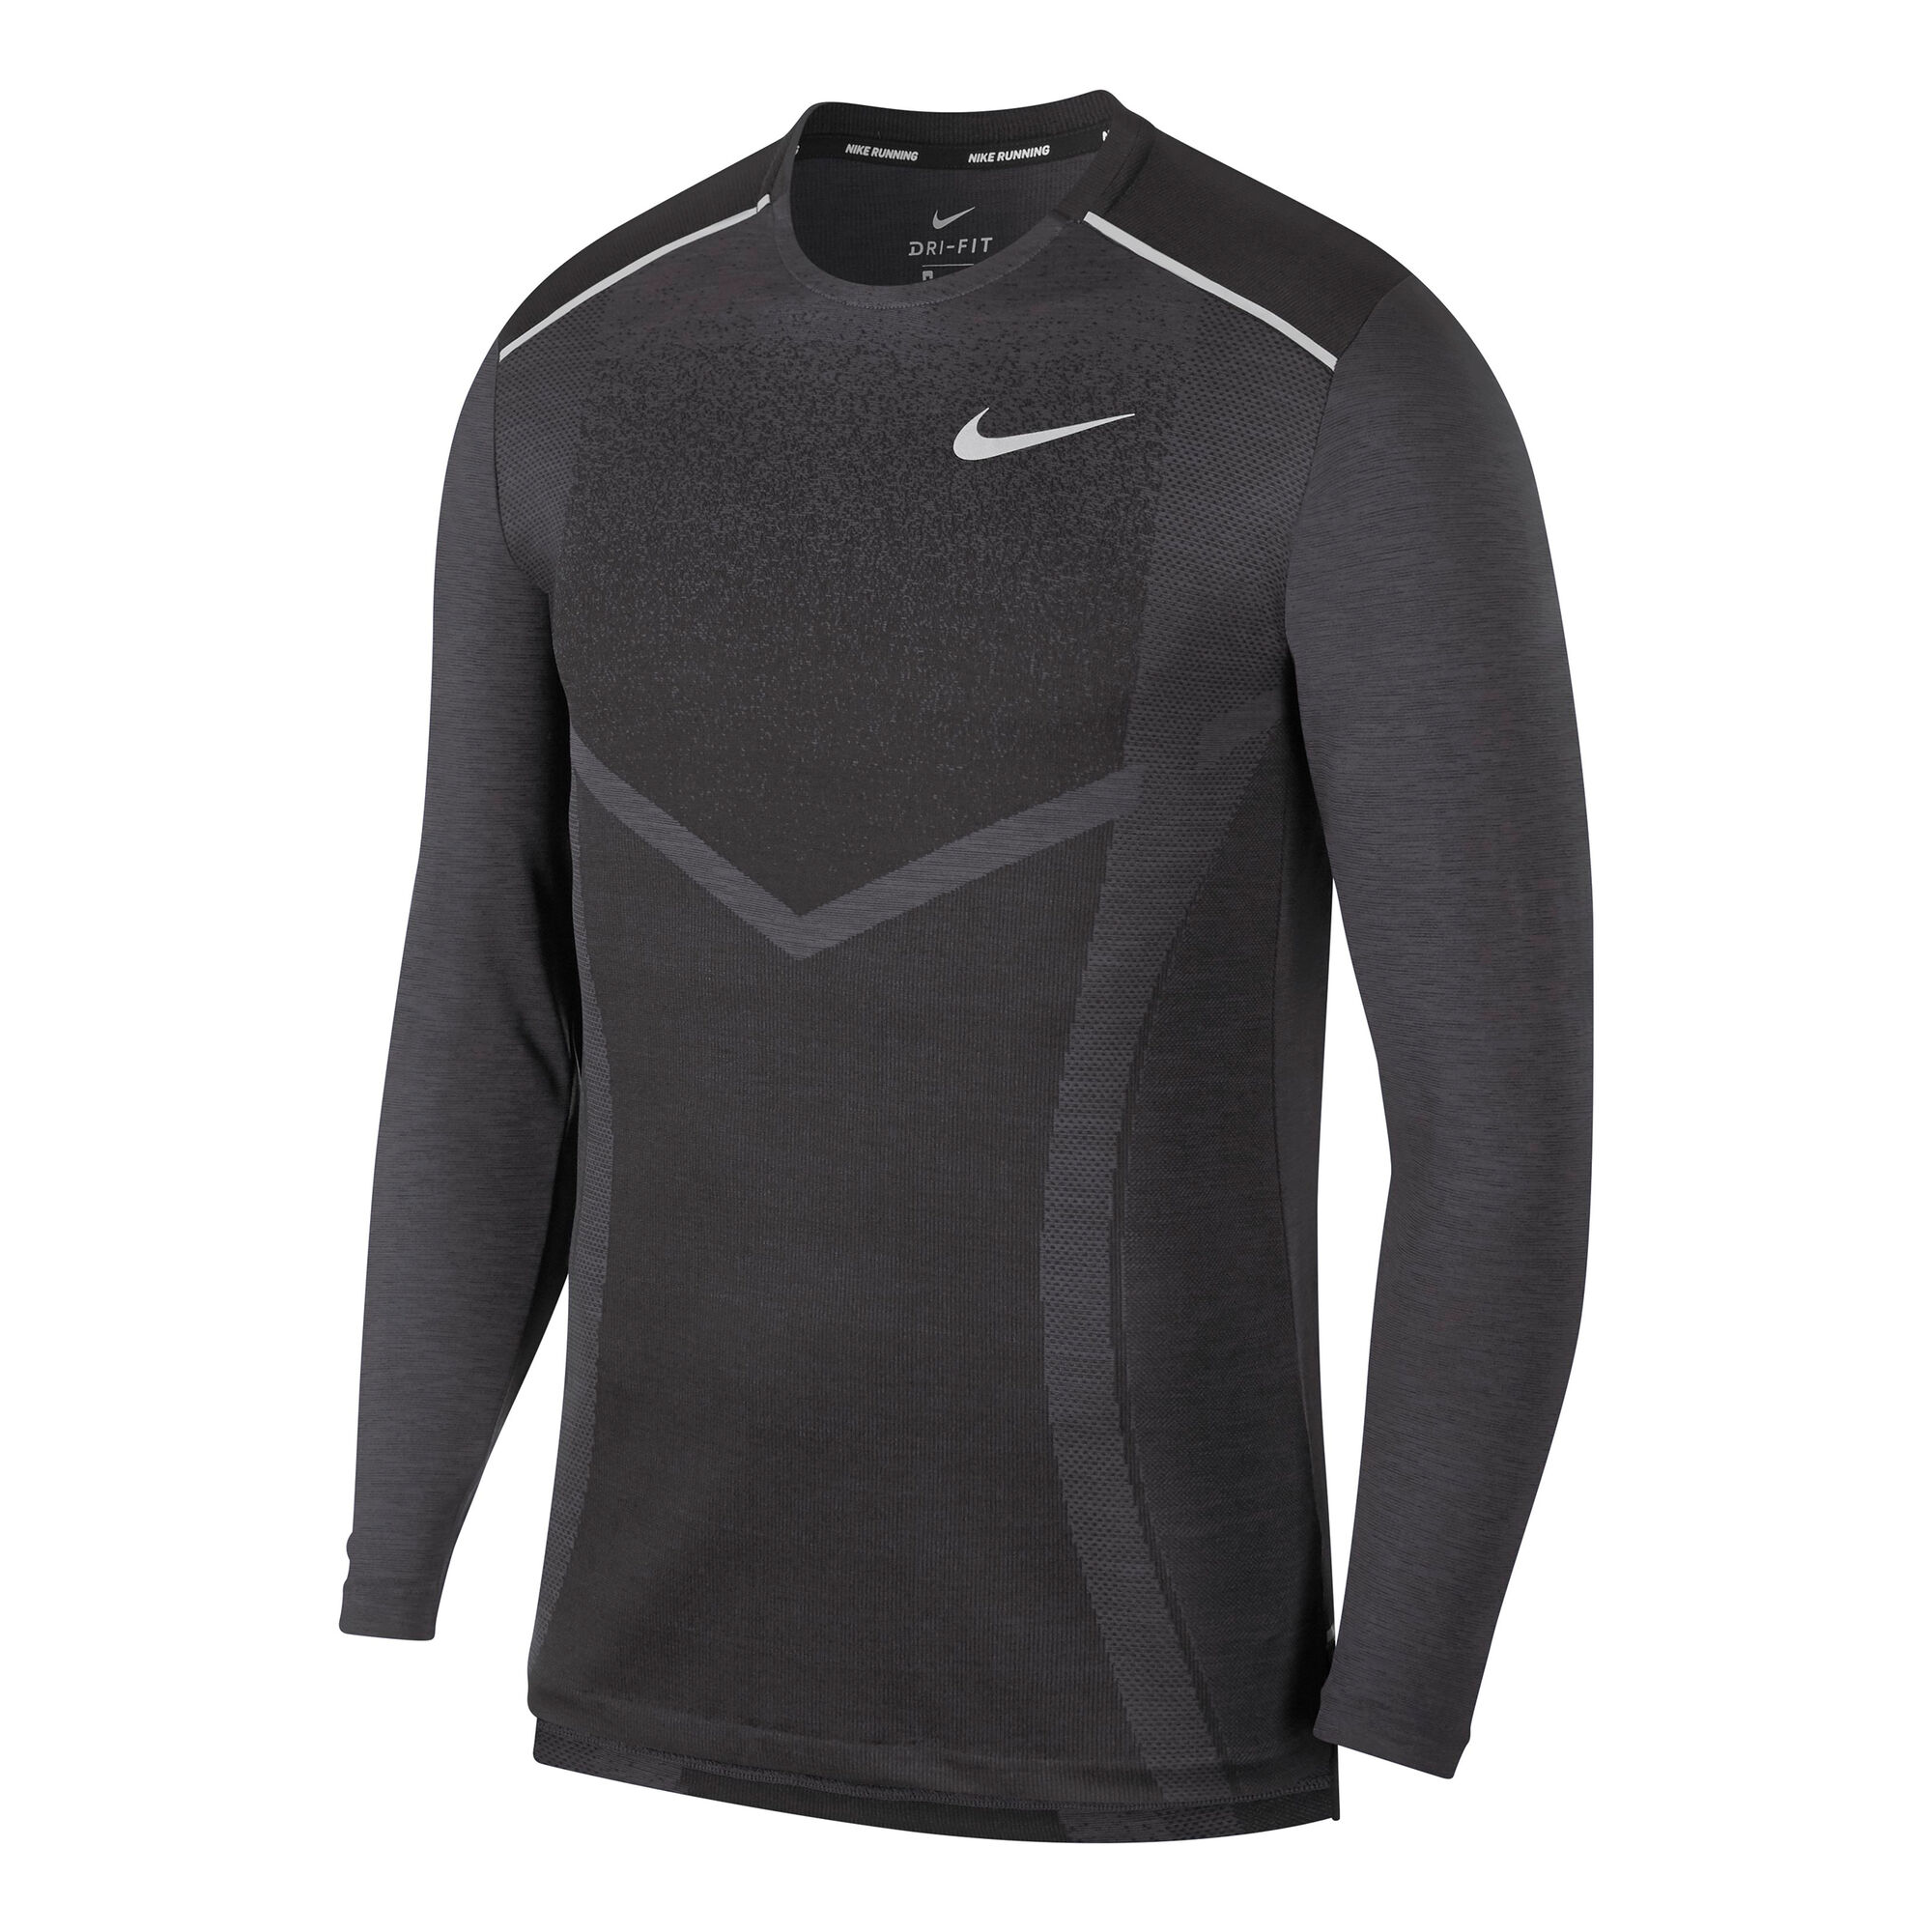 c2770007 buy Nike TechKnit Cool Ultra Long Sleeve Men - Dark Grey, Grey ...